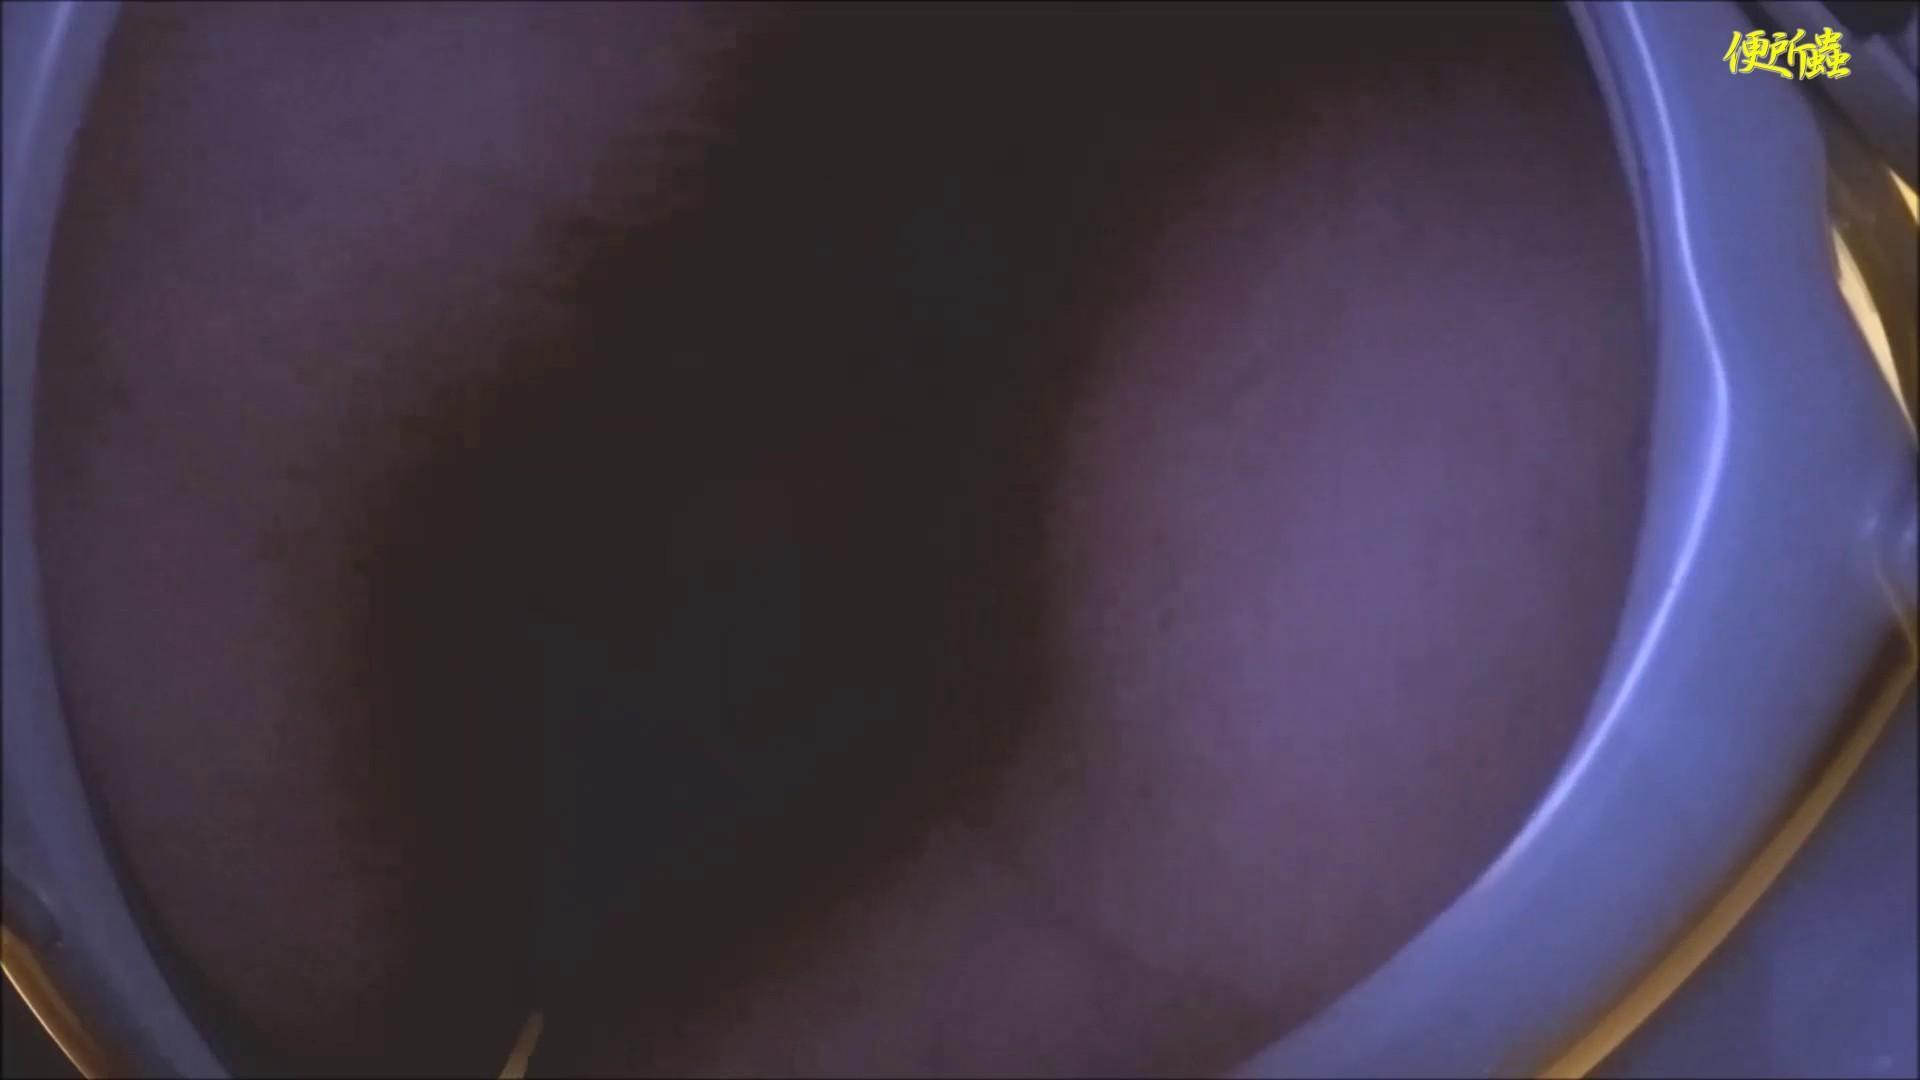 vol.07 便所蟲さんのリターン~寺子屋洗面所盗撮~※画質改善※総勢7名 エロいOL オマンコ無修正動画無料 64枚